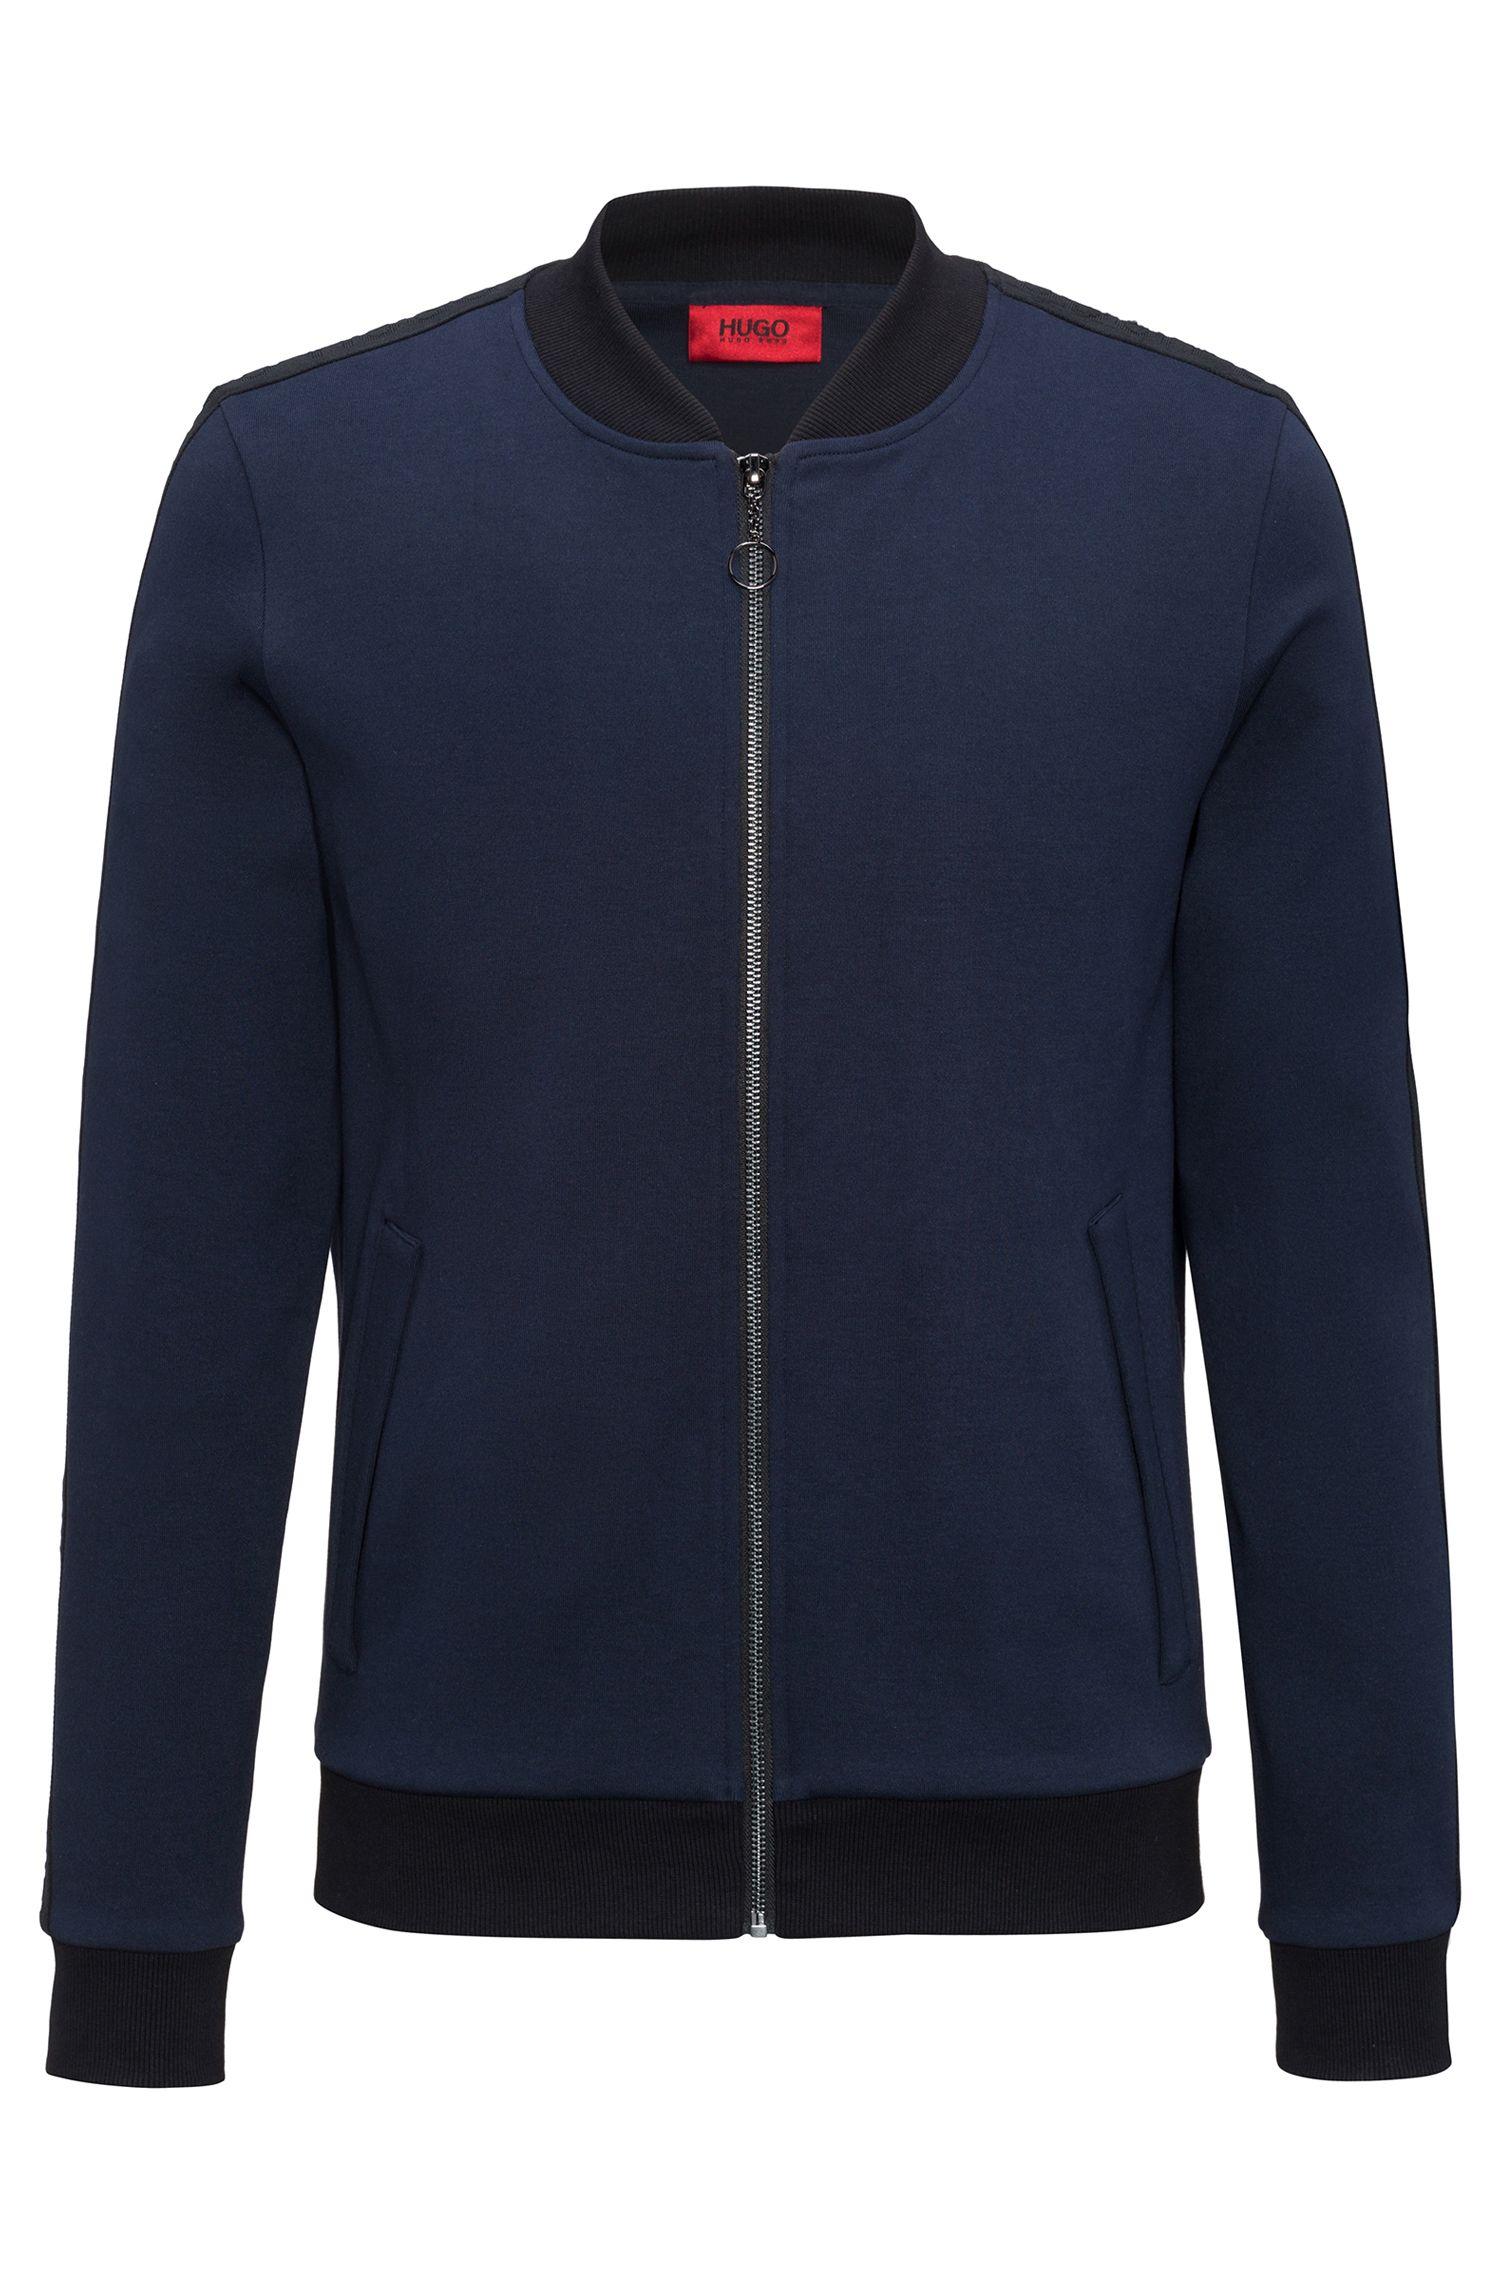 Cotton Full-Zip Sweat Jacket | Dacido, Dark Blue